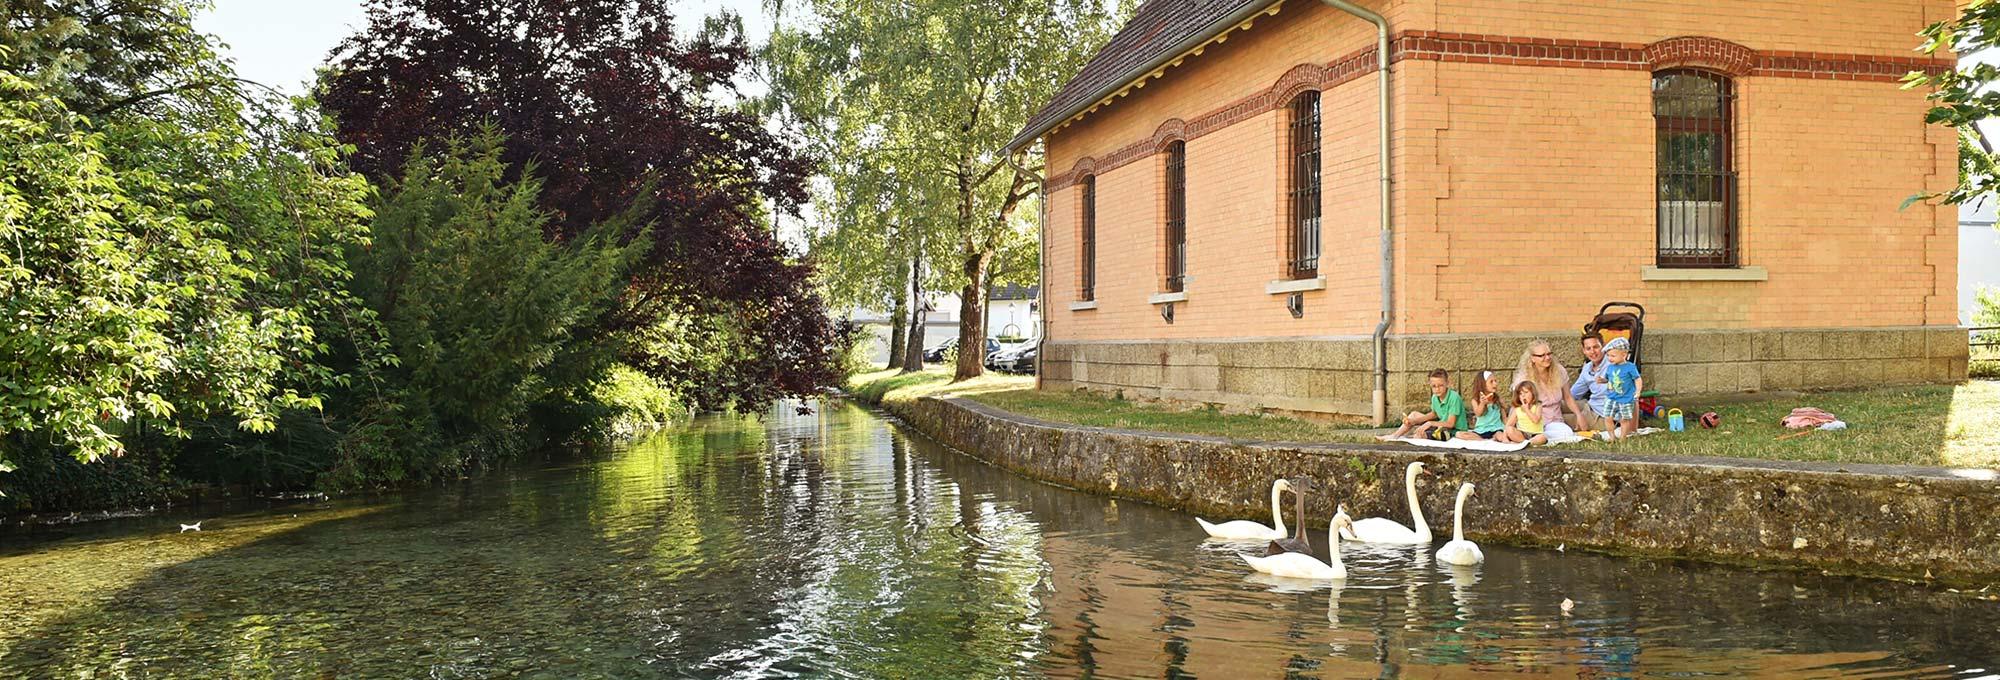 Langenau - Vacation in Germany